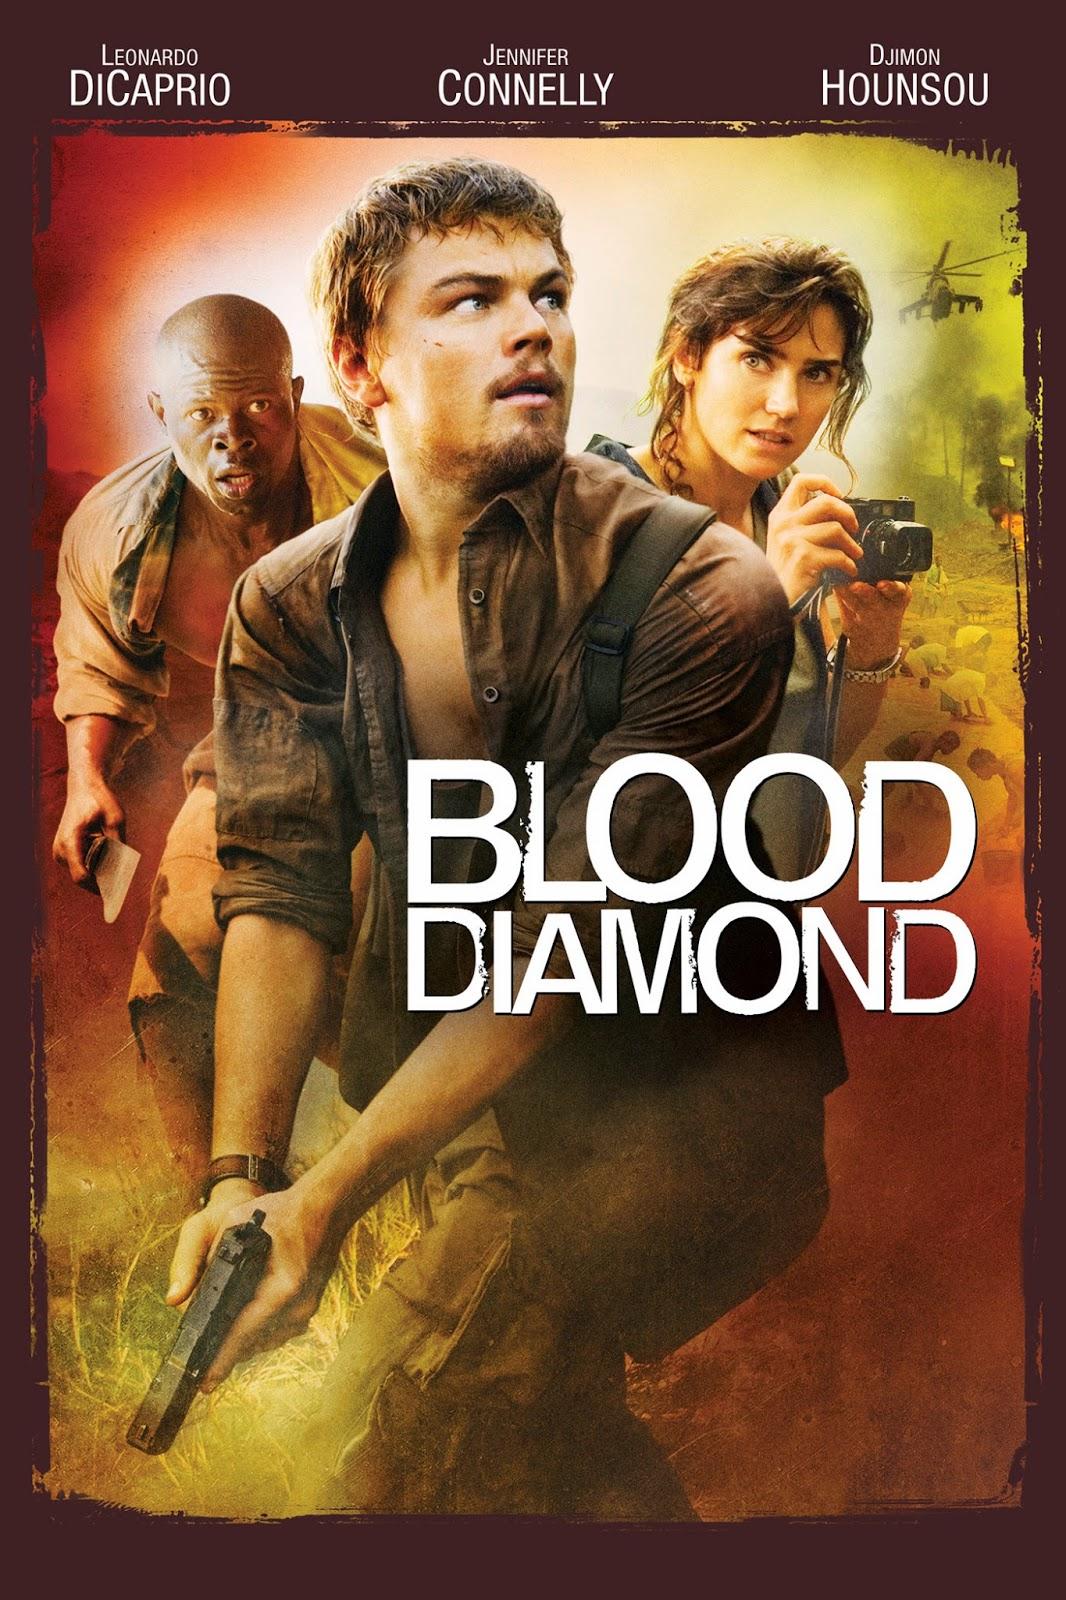 Blood Diamond เทพบุตร เพชรสีเลือด [HD][พากย์ไทย]